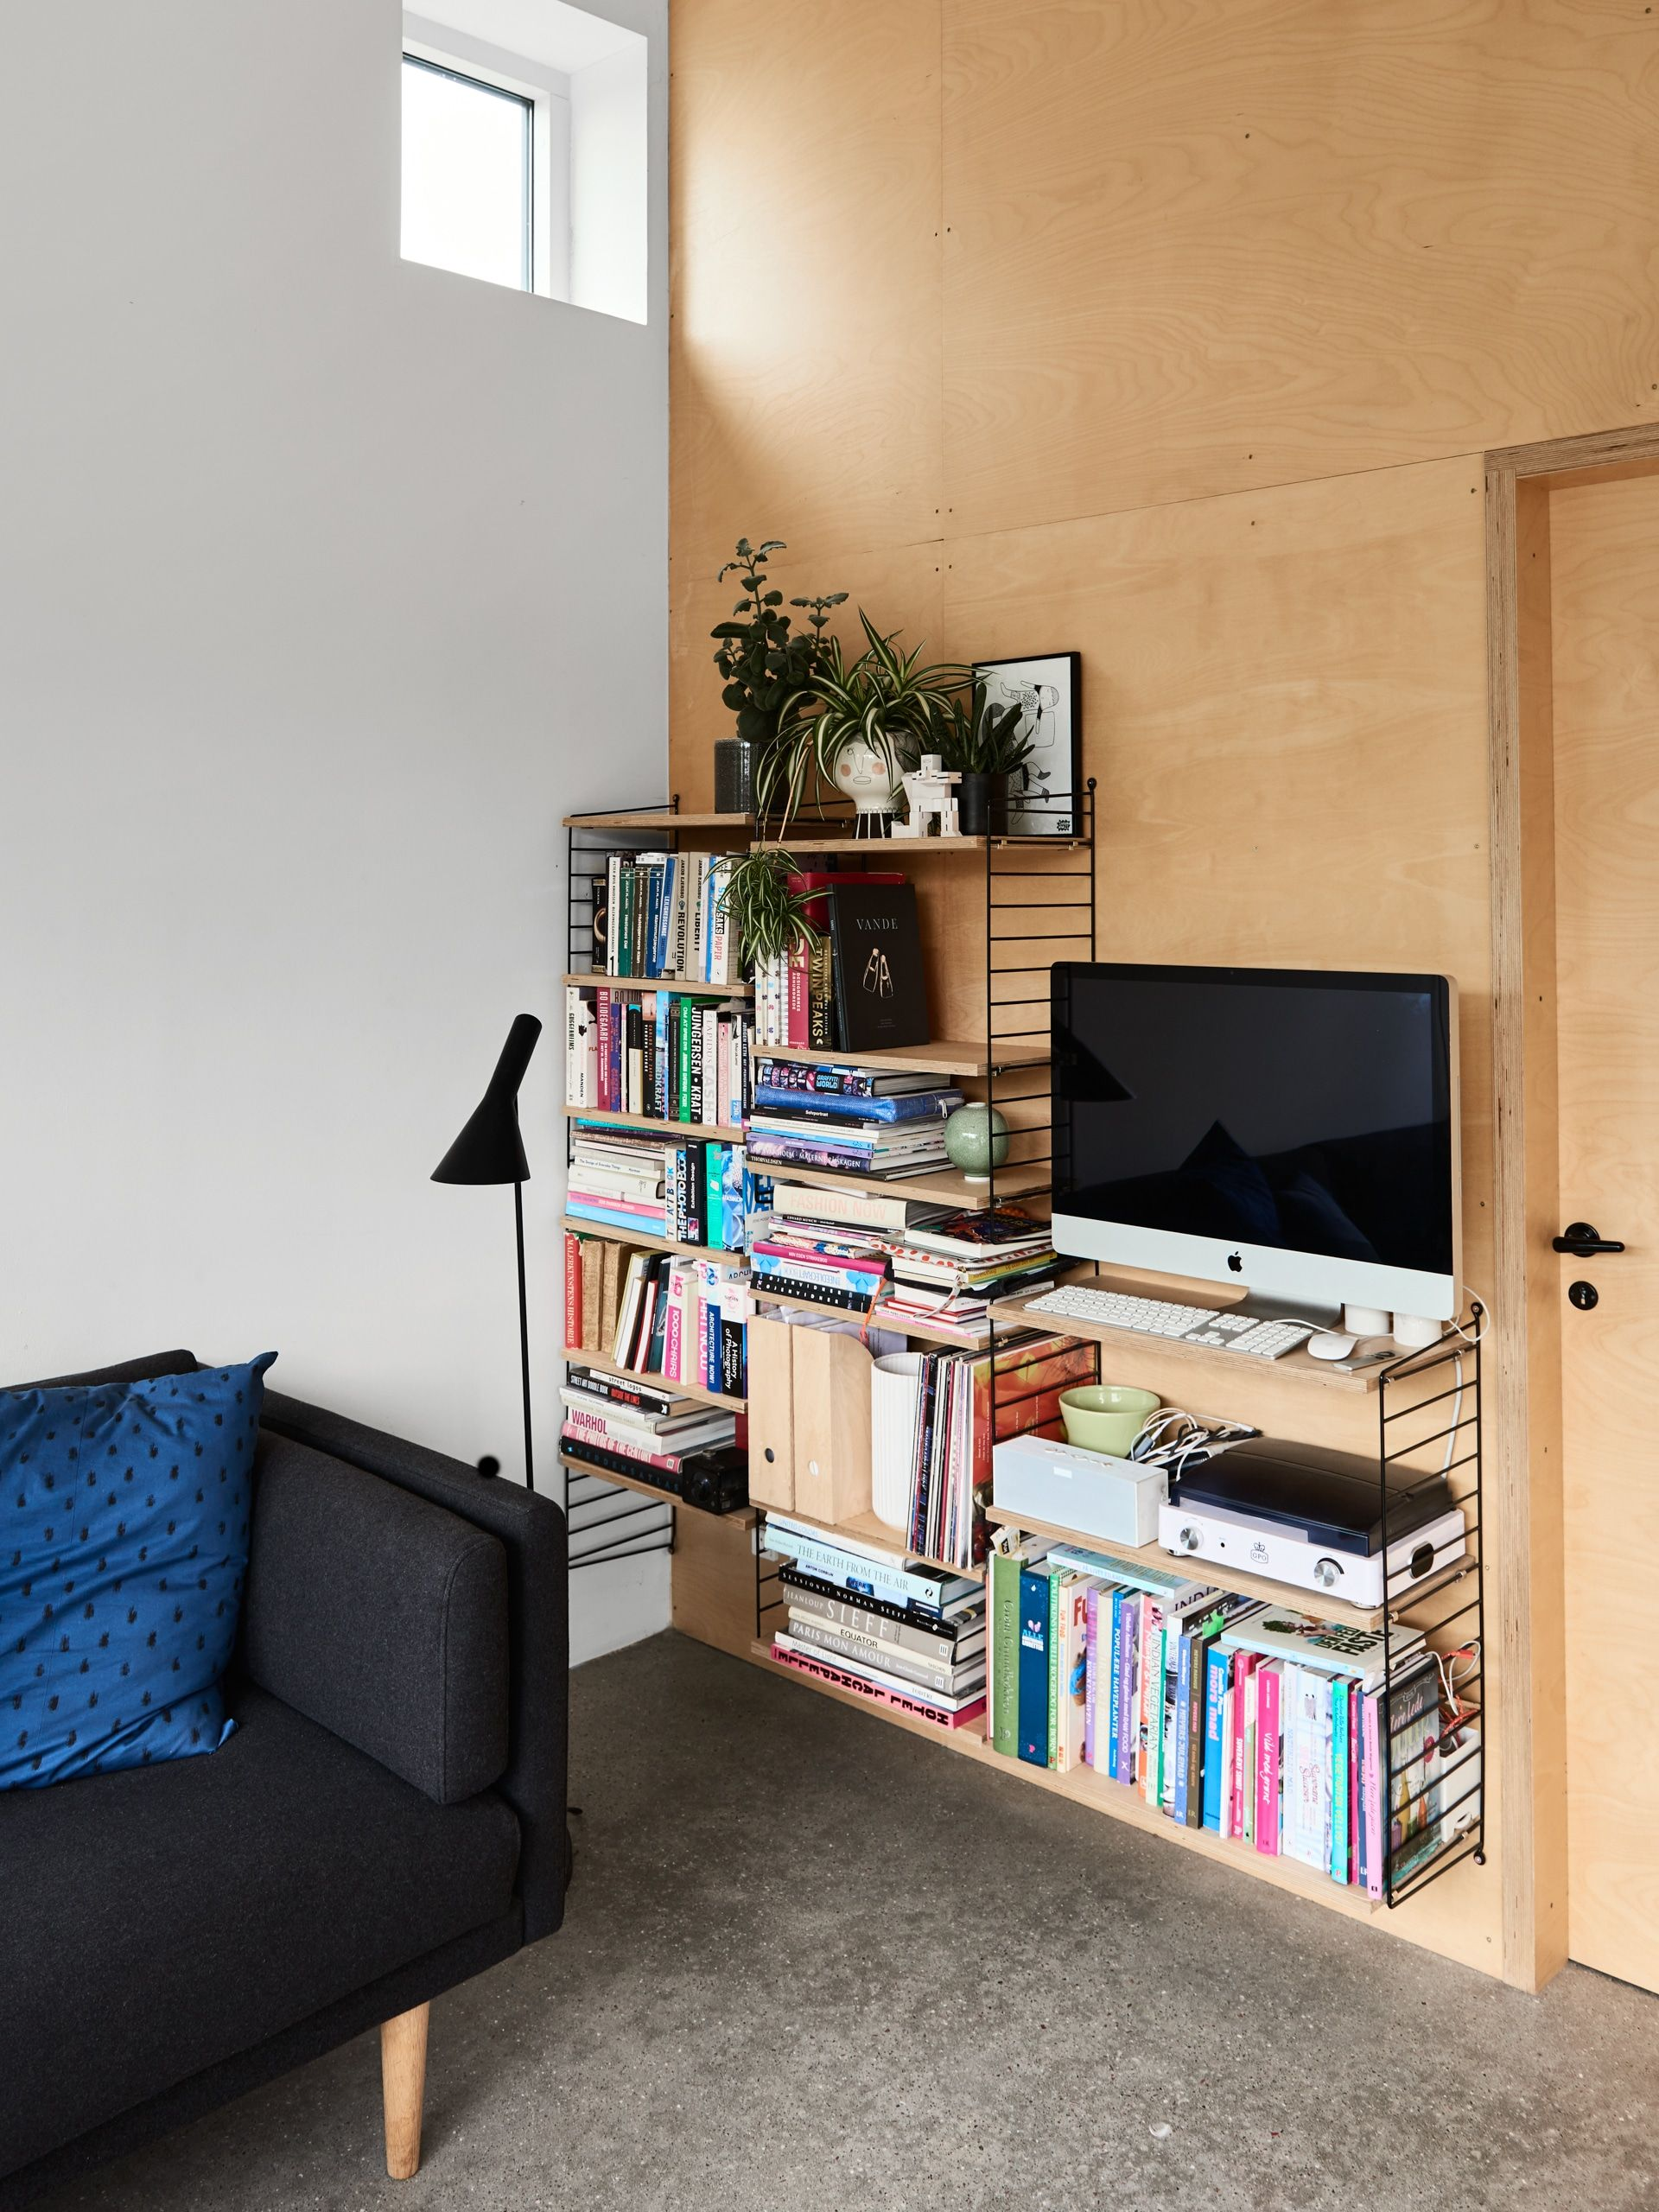 Inspiration HF Engly on Amager, Denmark Kitchen design